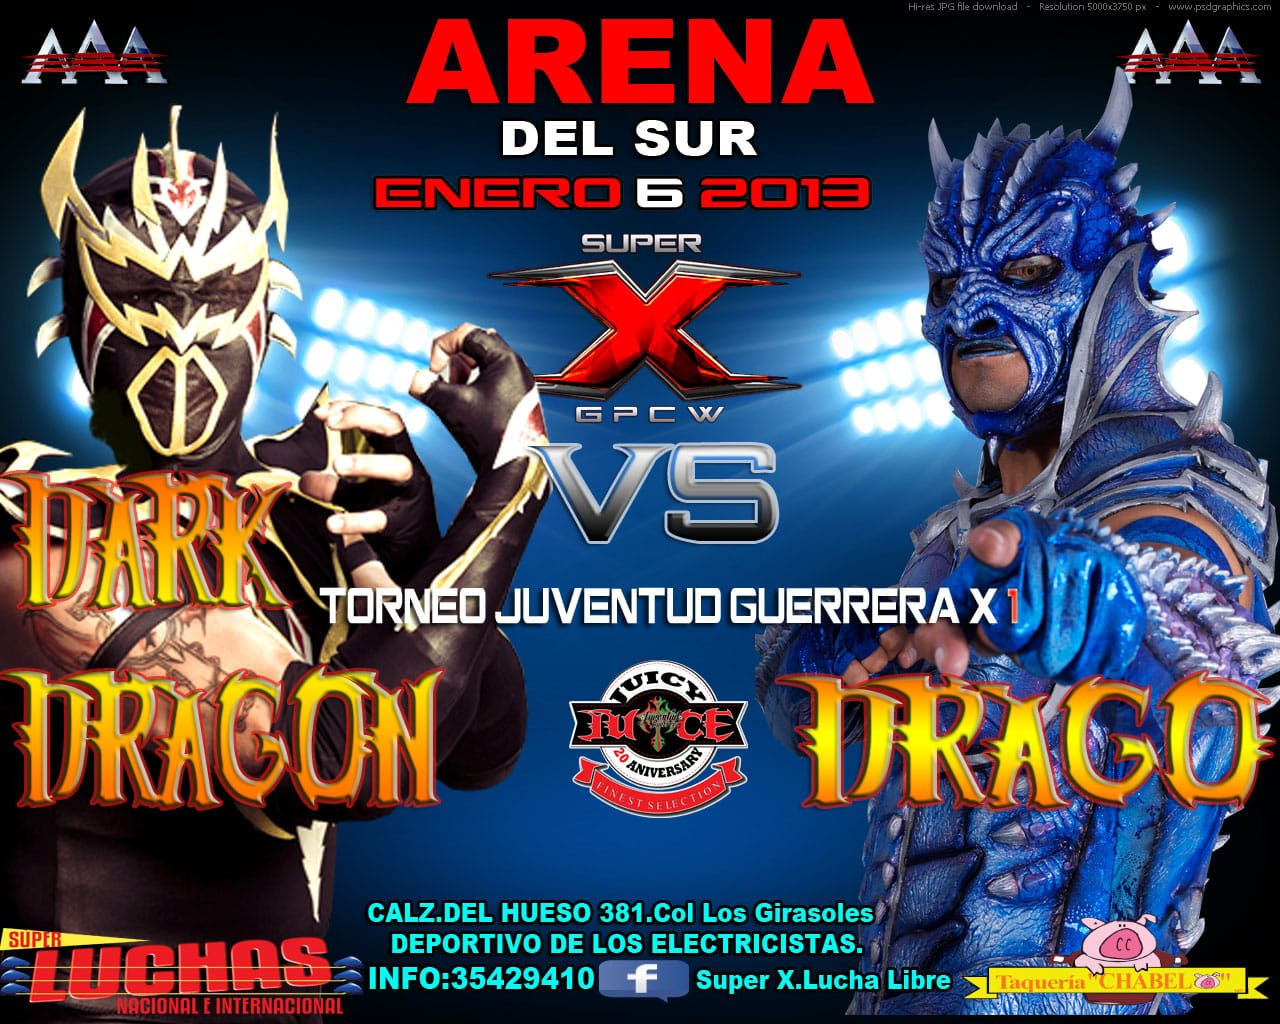 Dark Dragon vs. Drago (Super X - 6/1/2013)